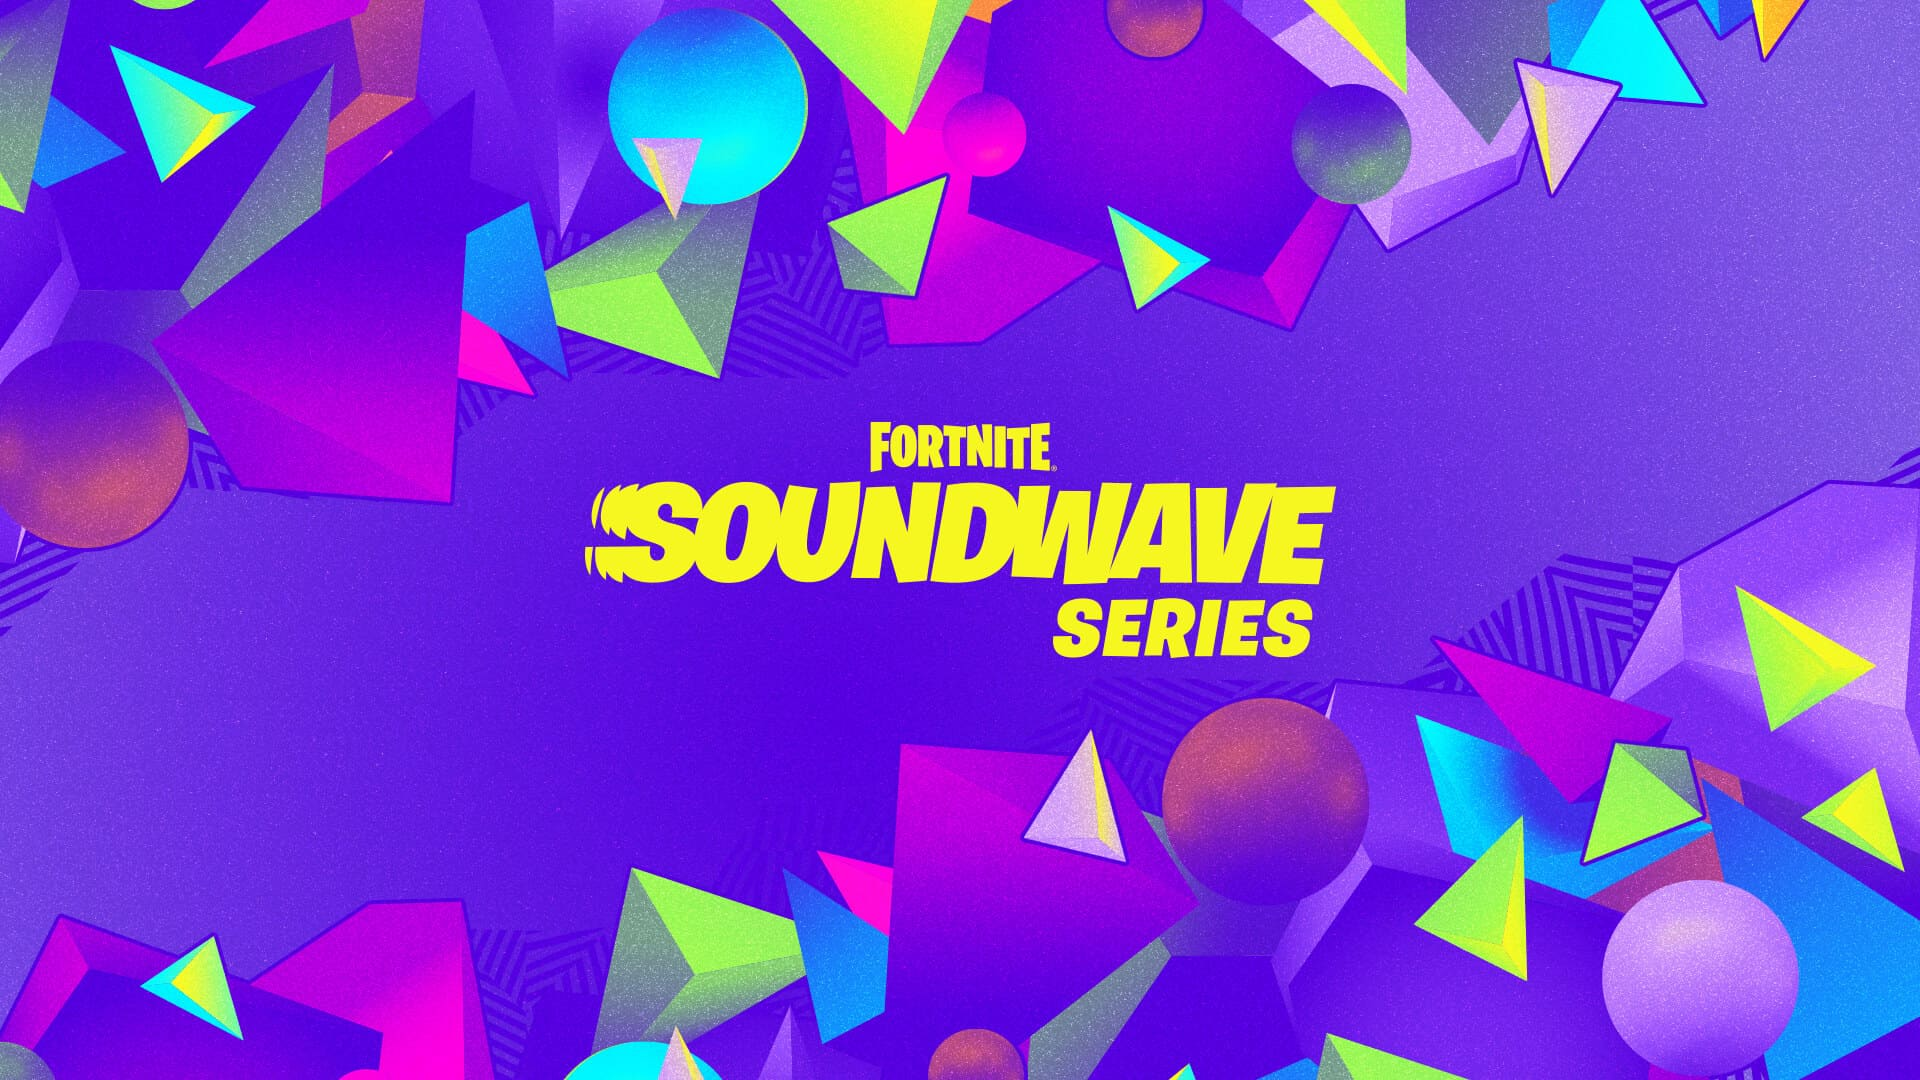 soundwave series